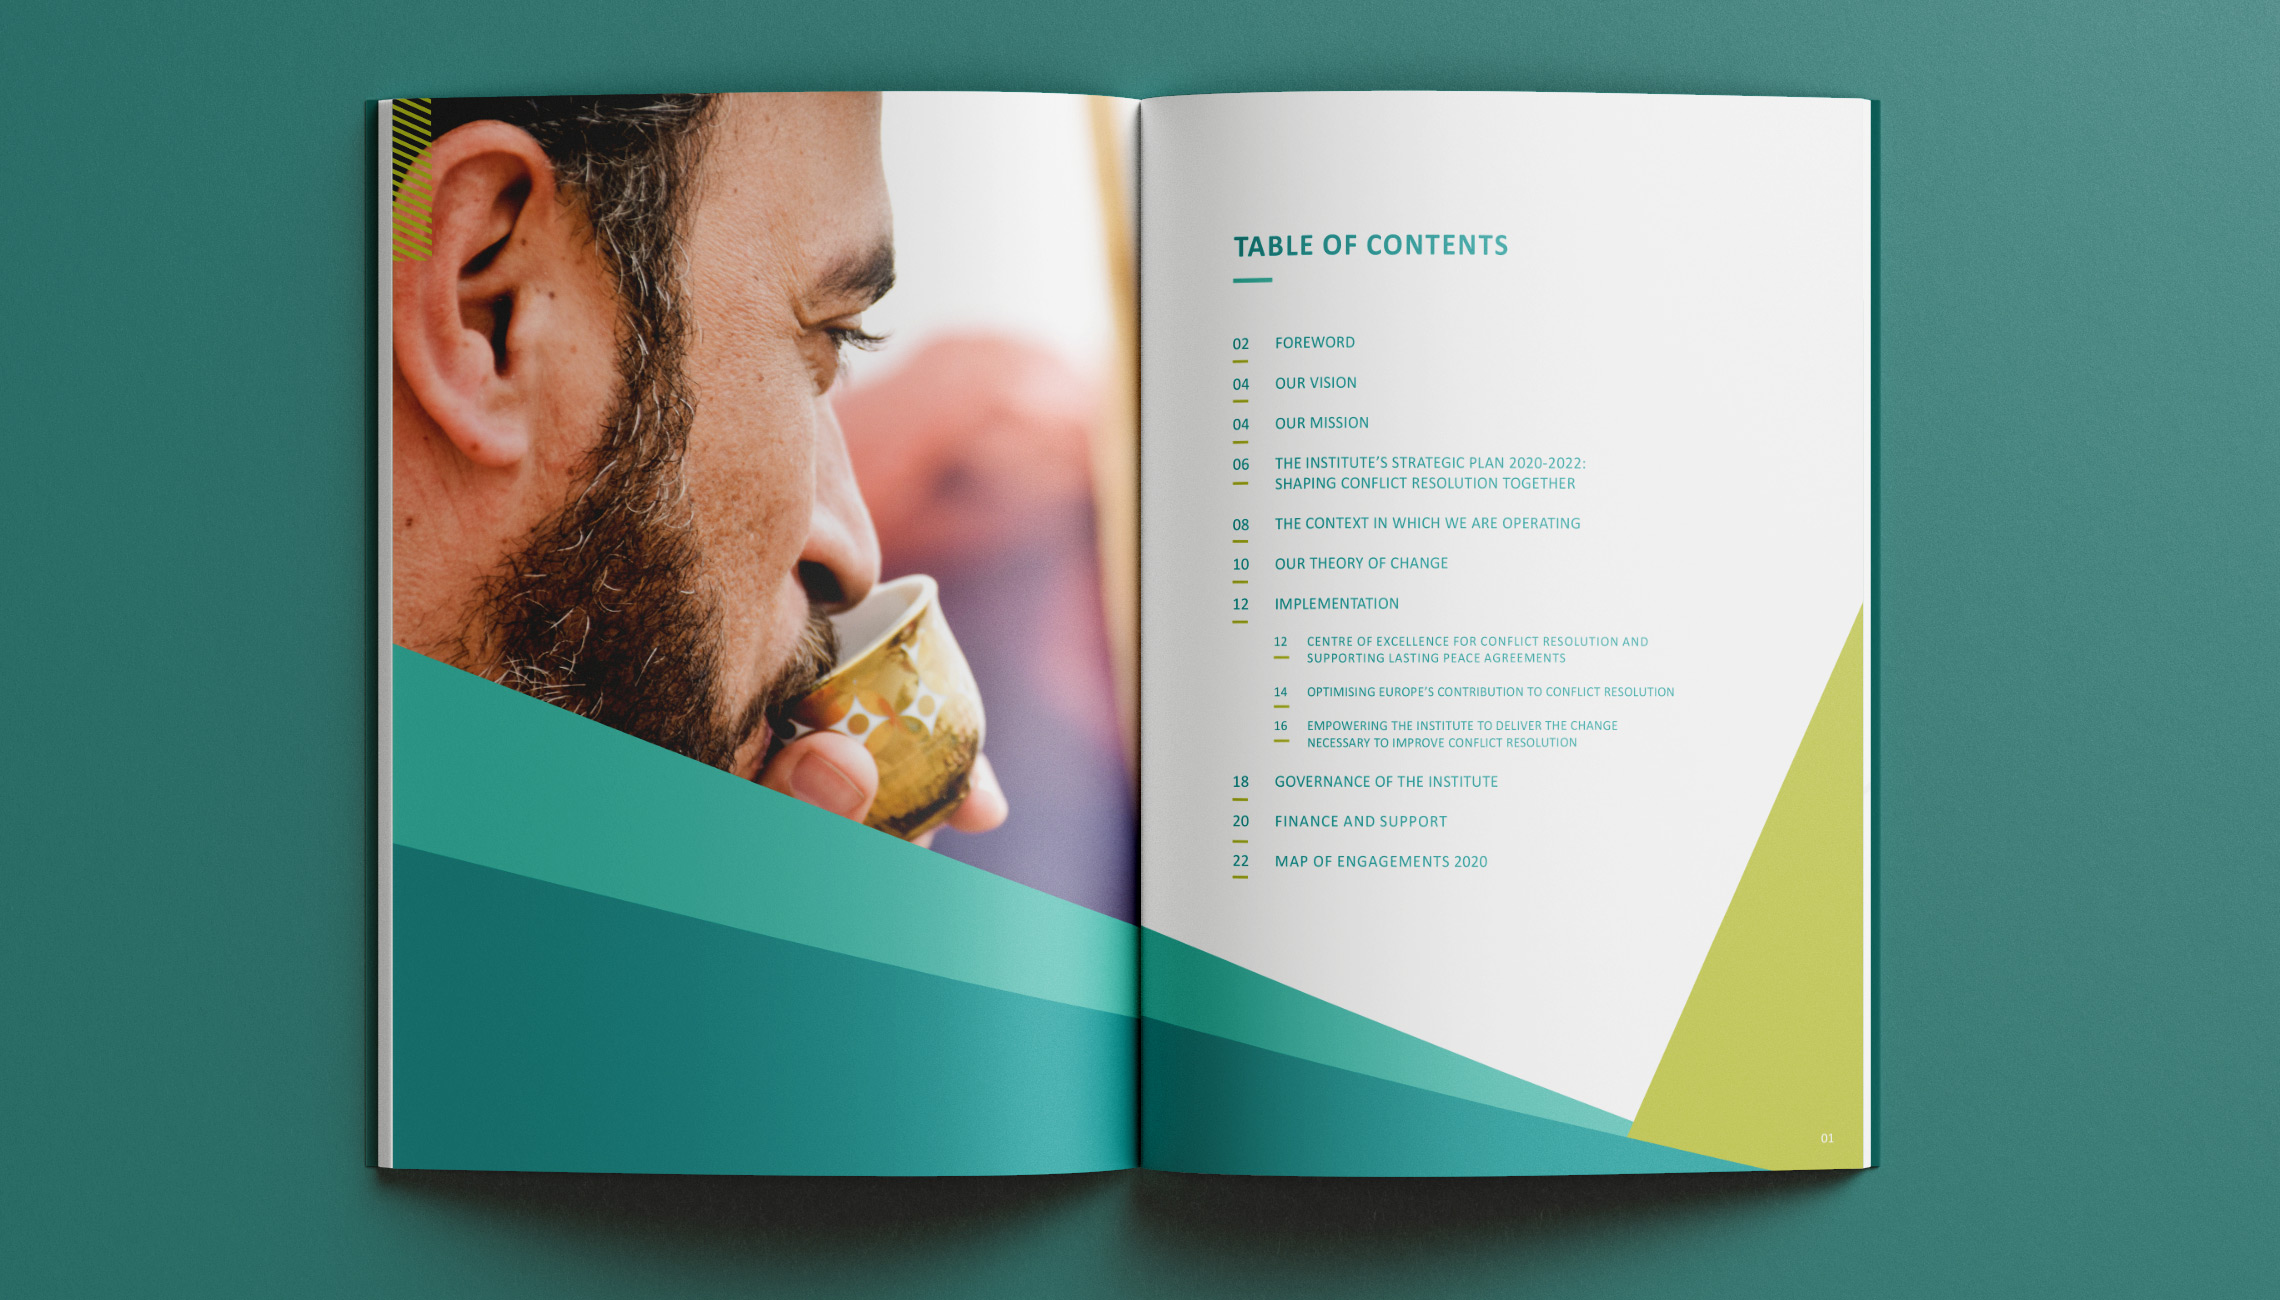 publication: Design of Strategic plan - image 2